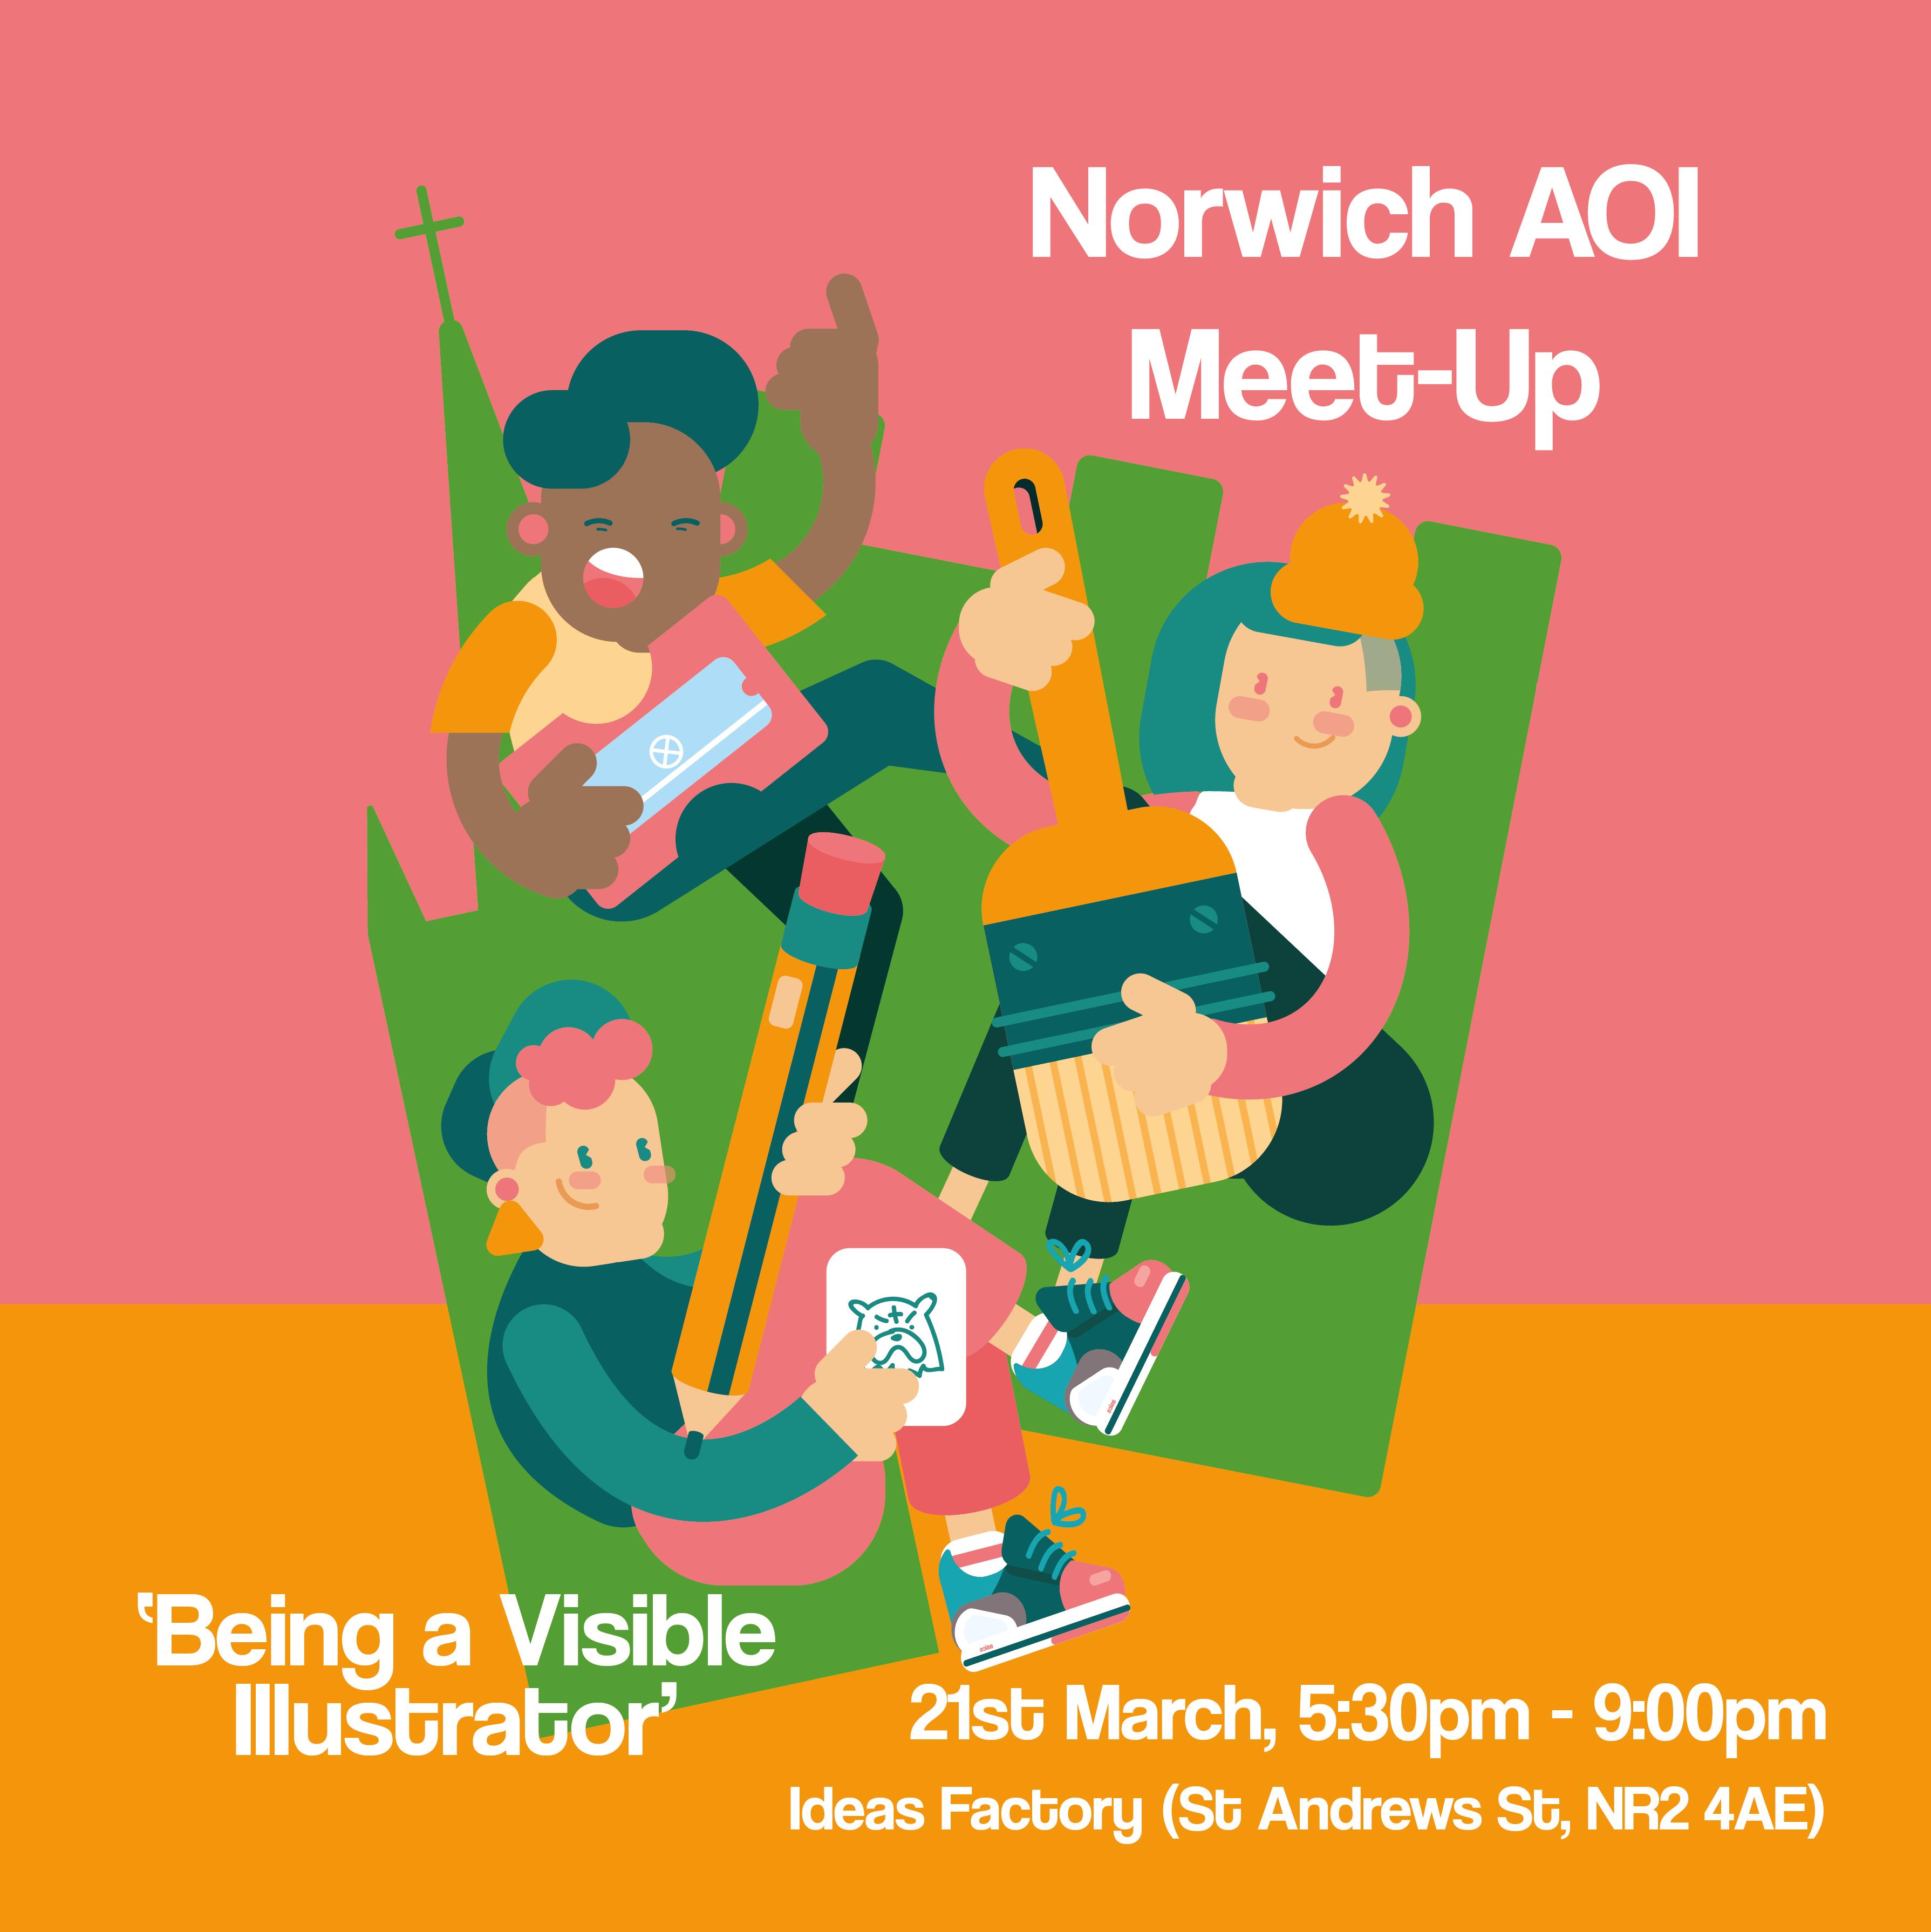 Norwich AOI Meetup: Episode I 'Being a Visibl